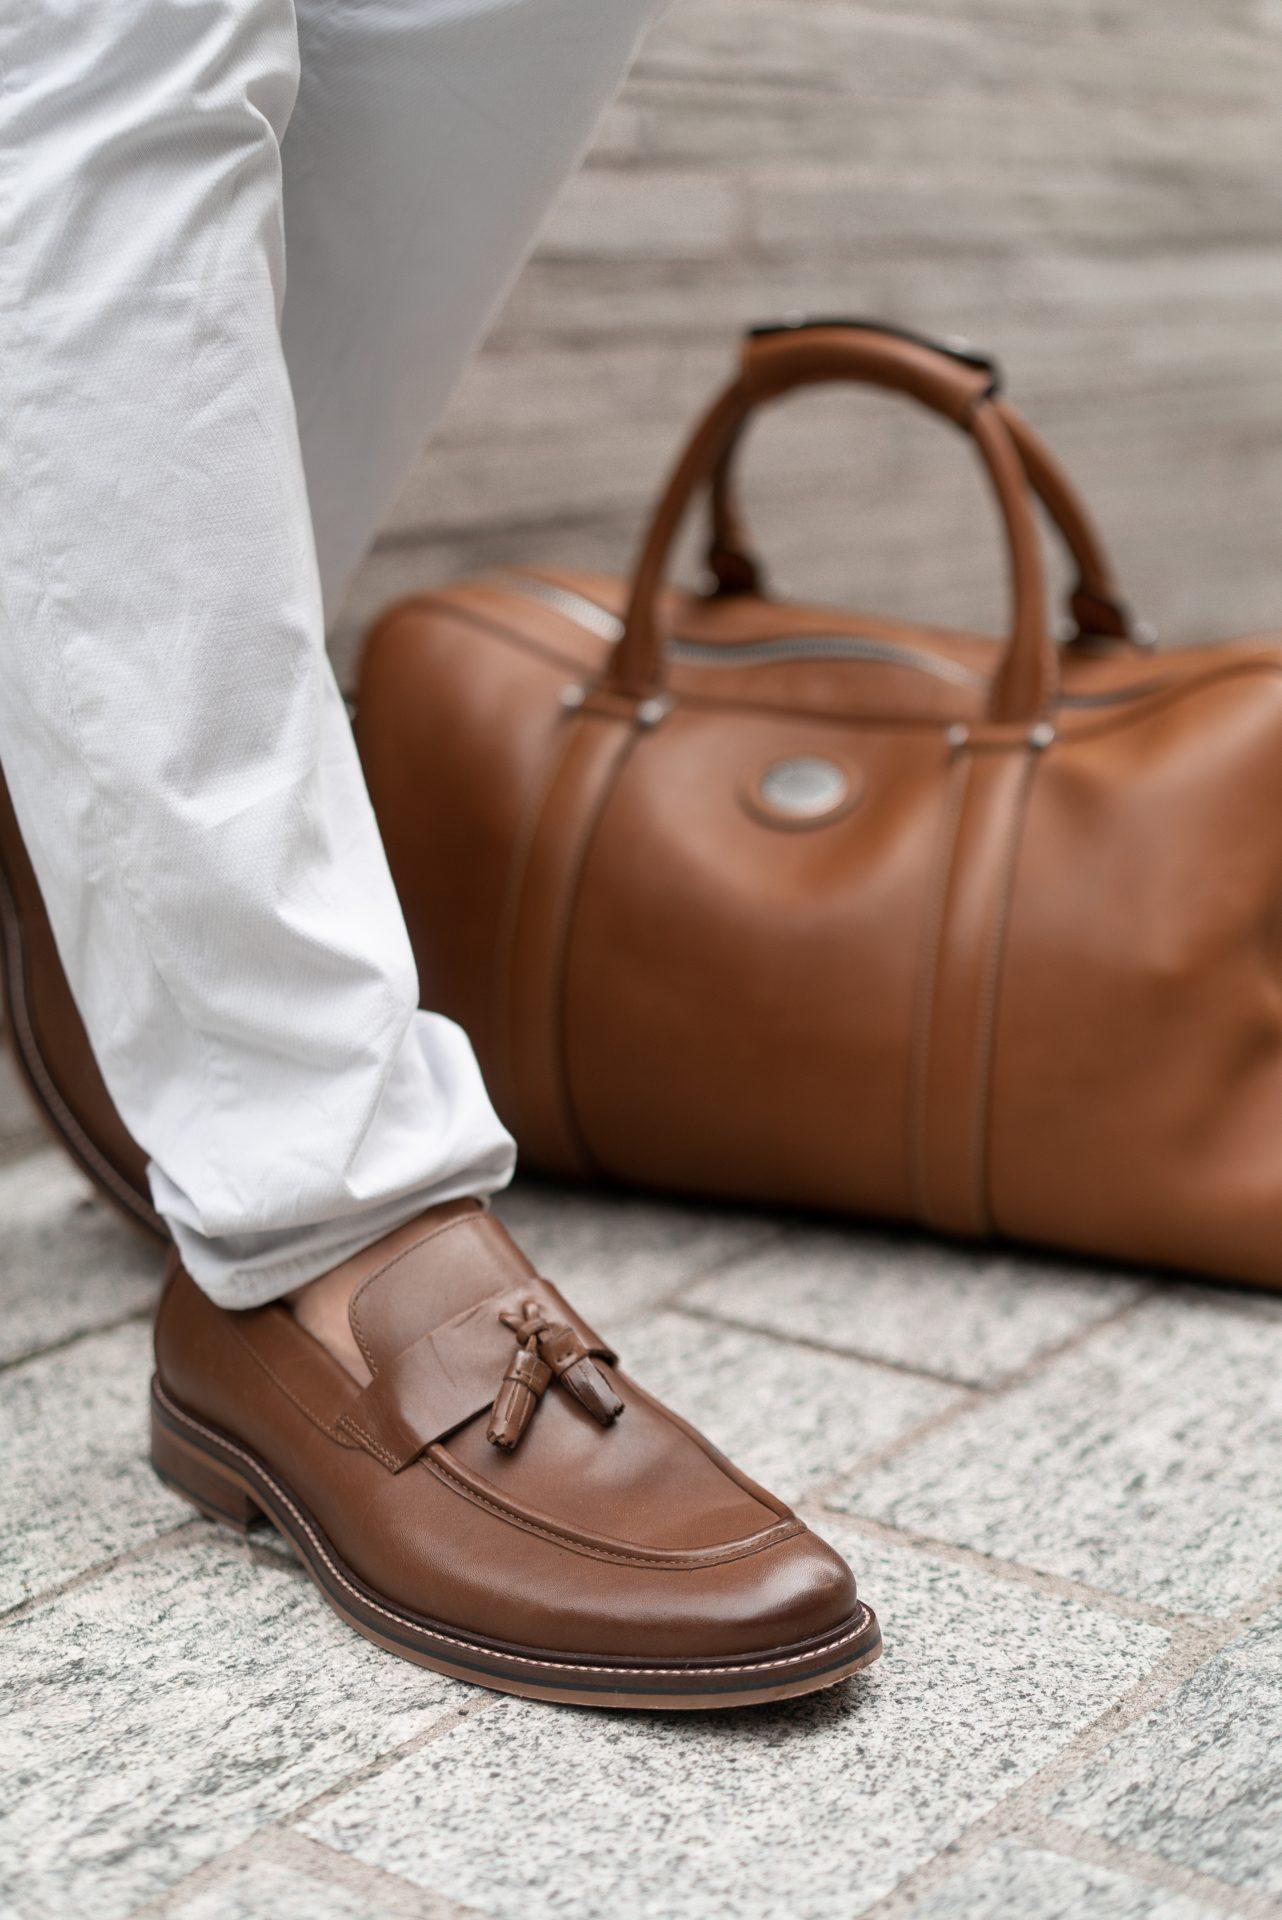 Zara Summer Autumn Menswear Look Guess Trousers Aspinal London Aerodrome Bag David Gandy